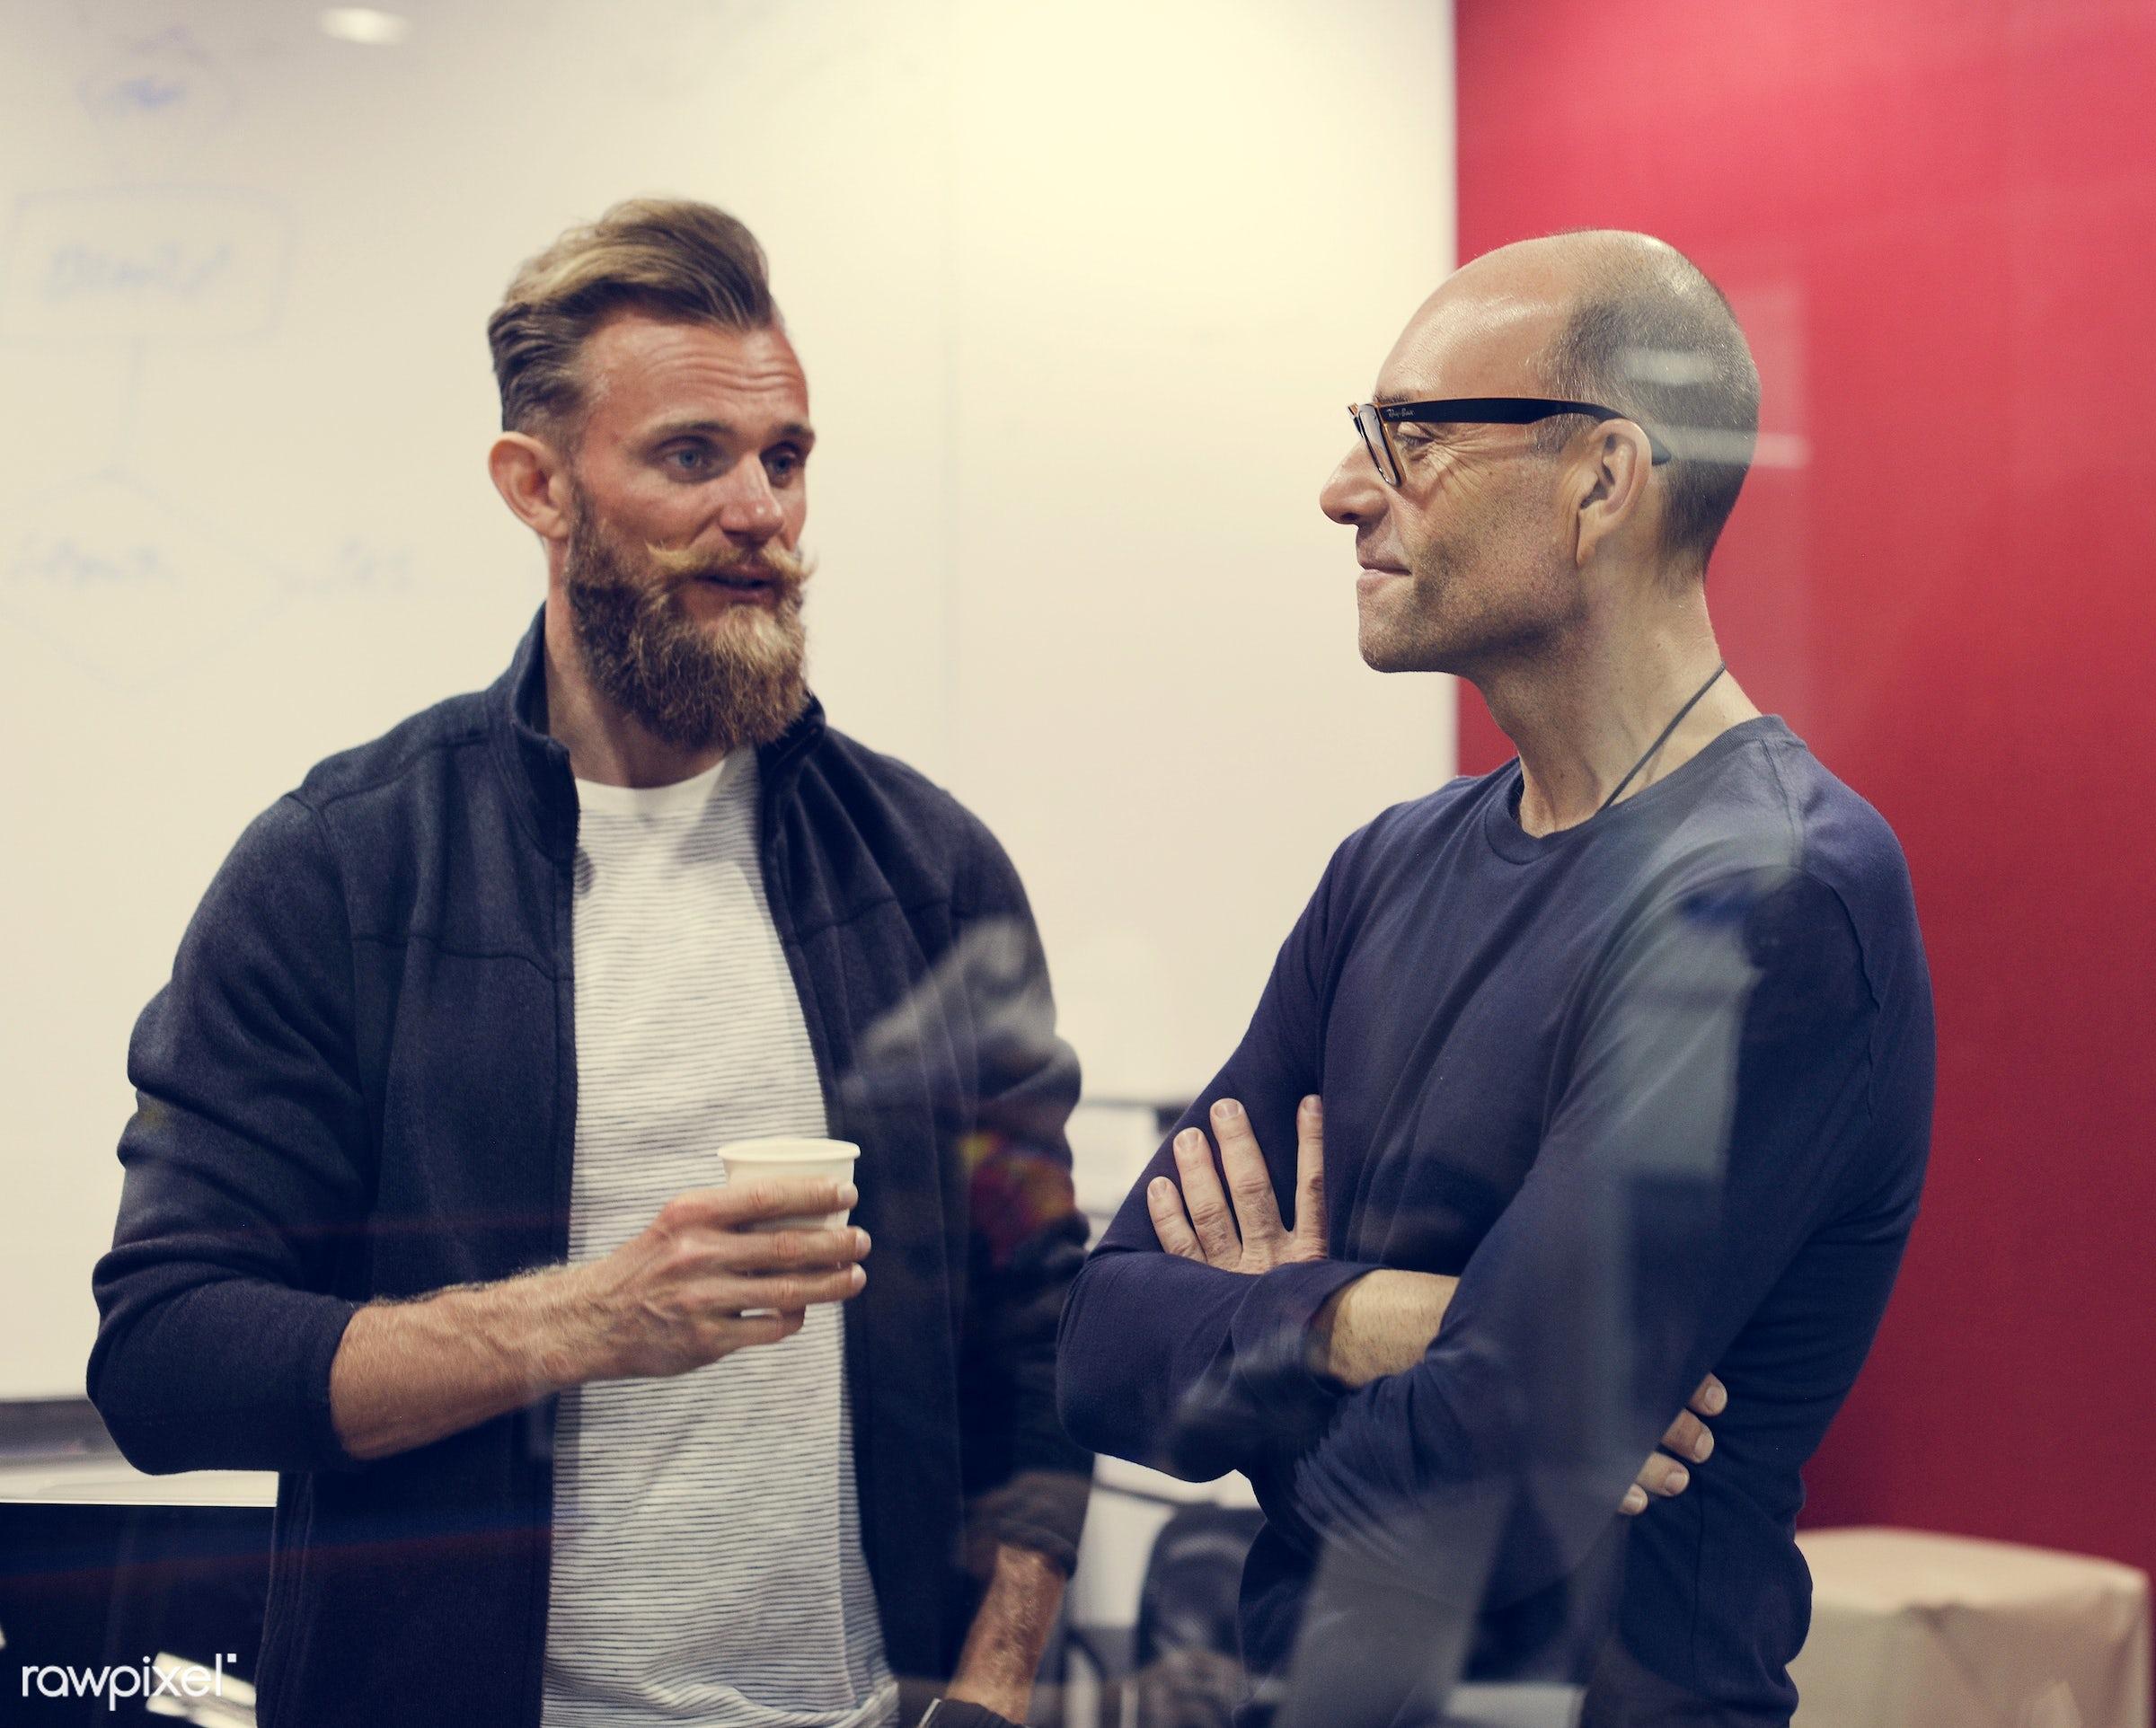 beard, break, business, businesspeople, casual, caucasian, colleagues, company, coworking, diverse, diversity, entrepreneur...